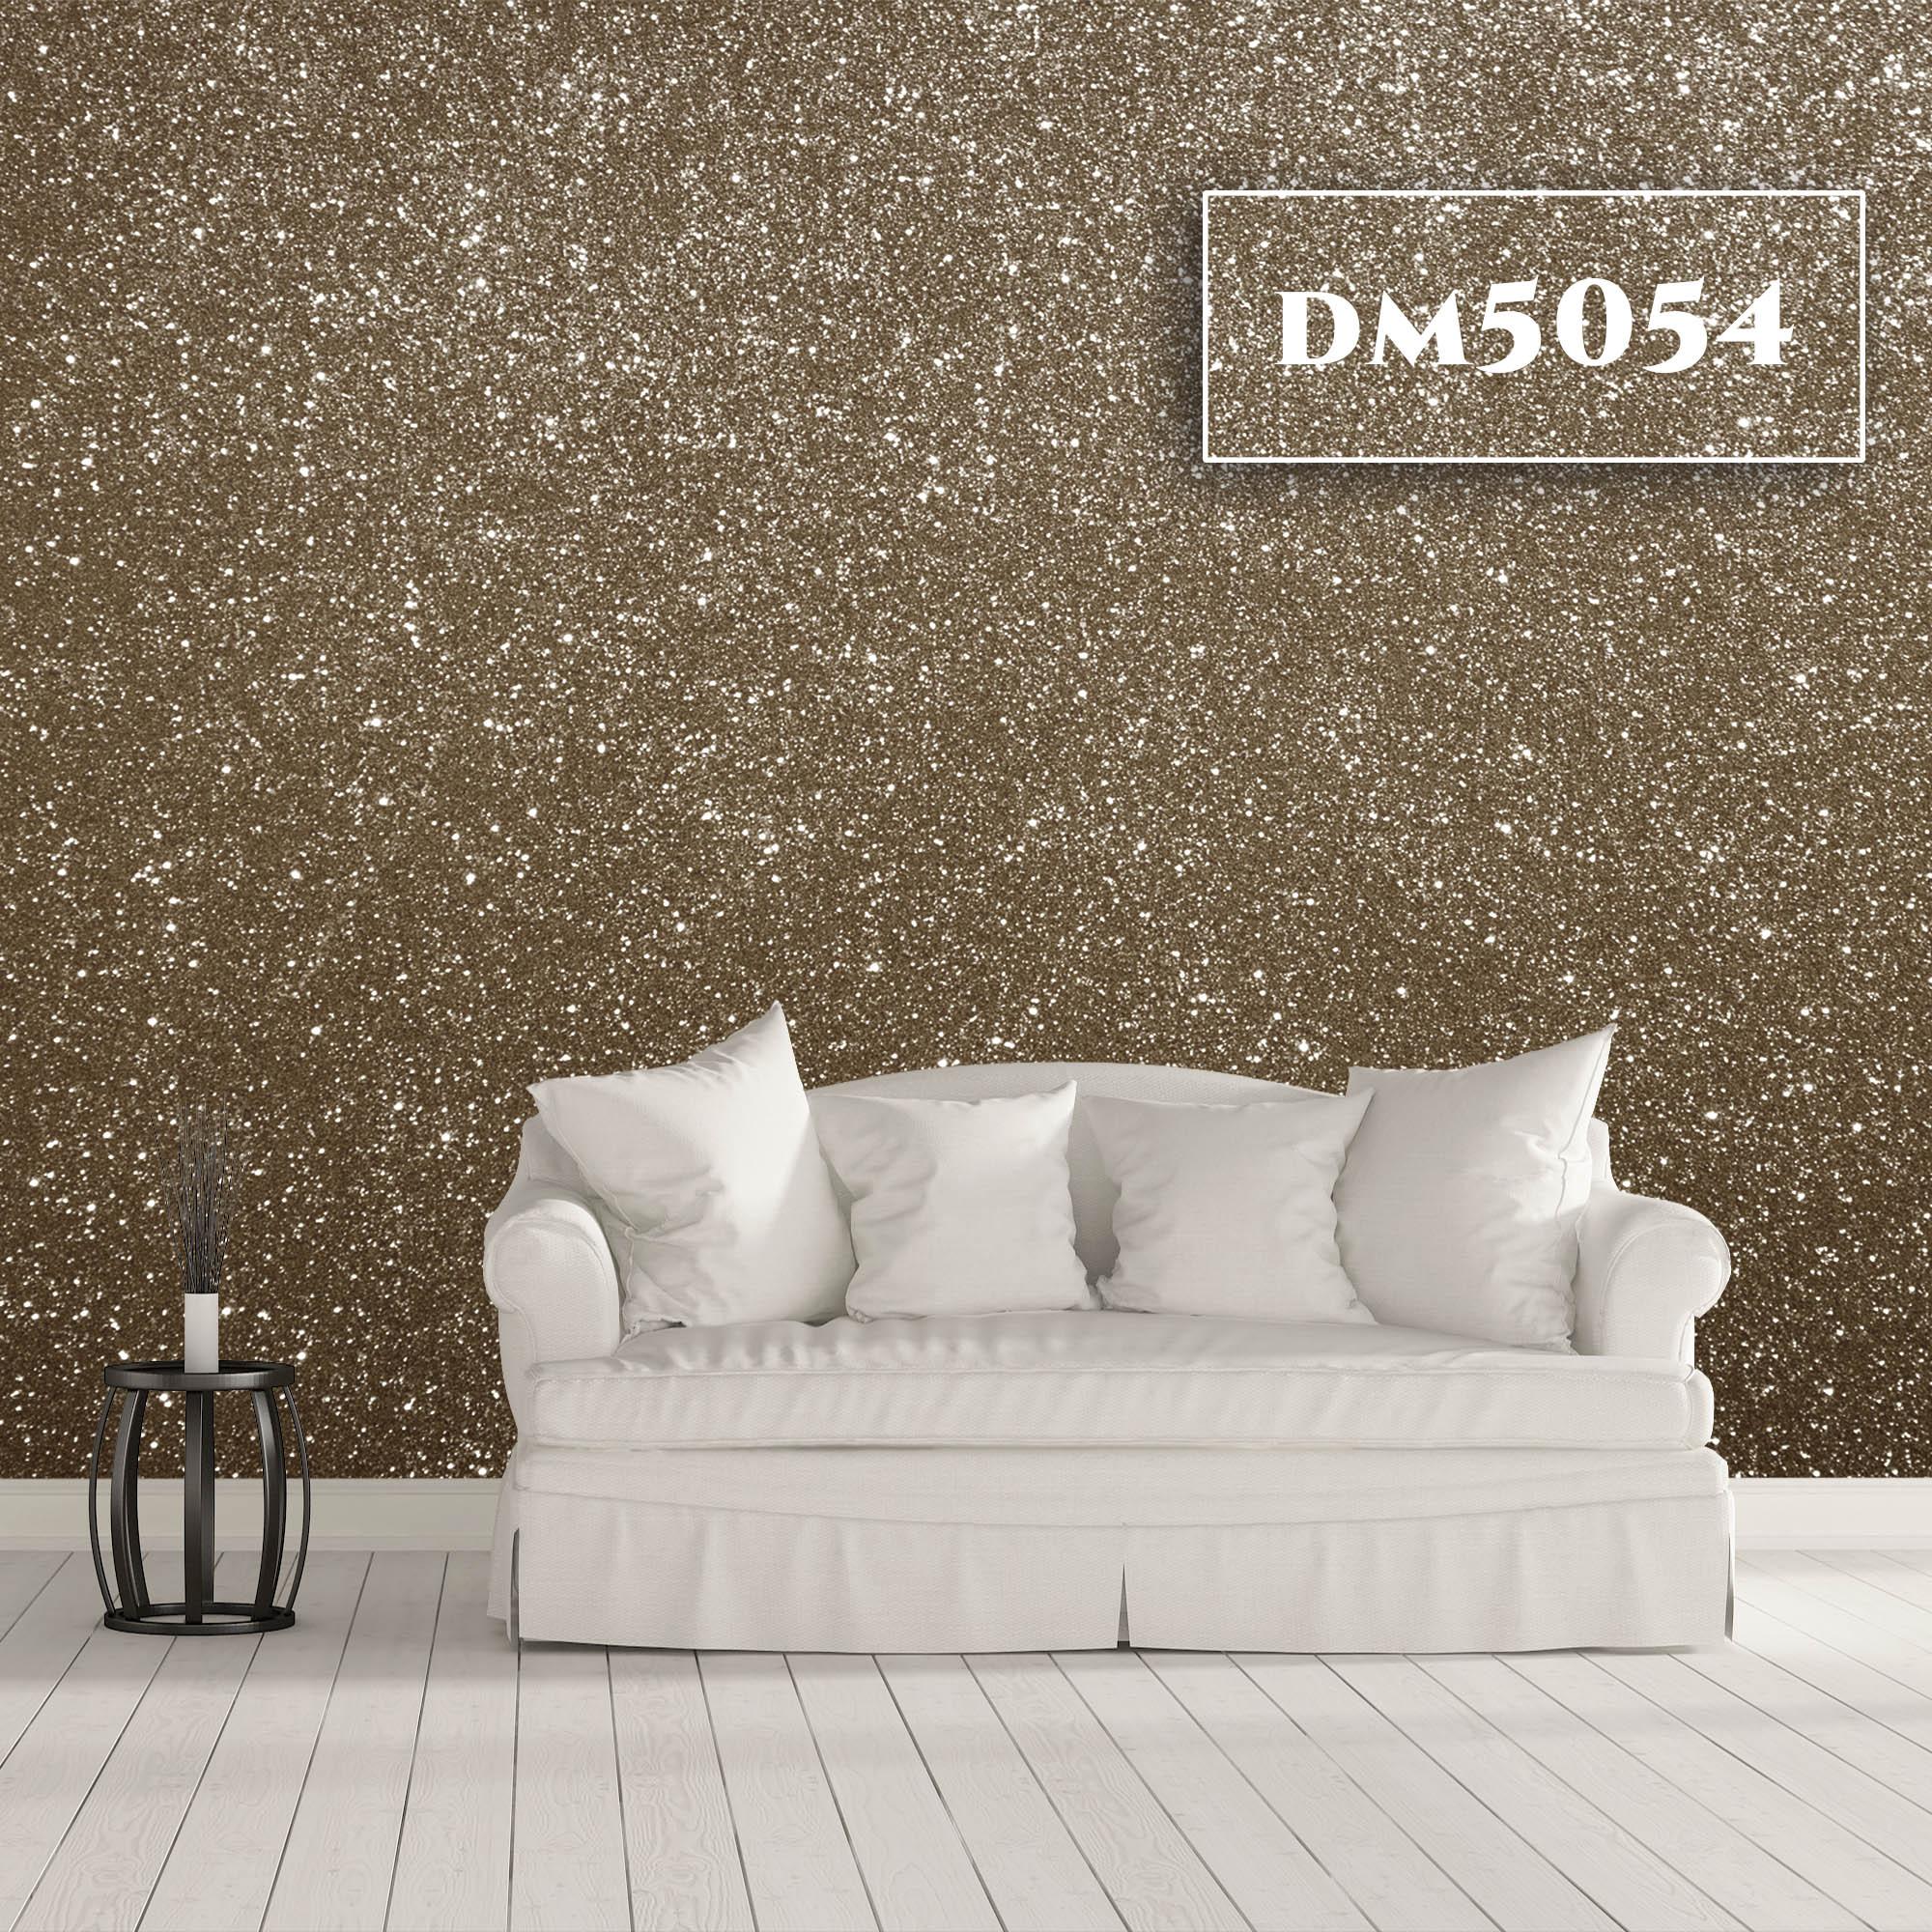 DM5054